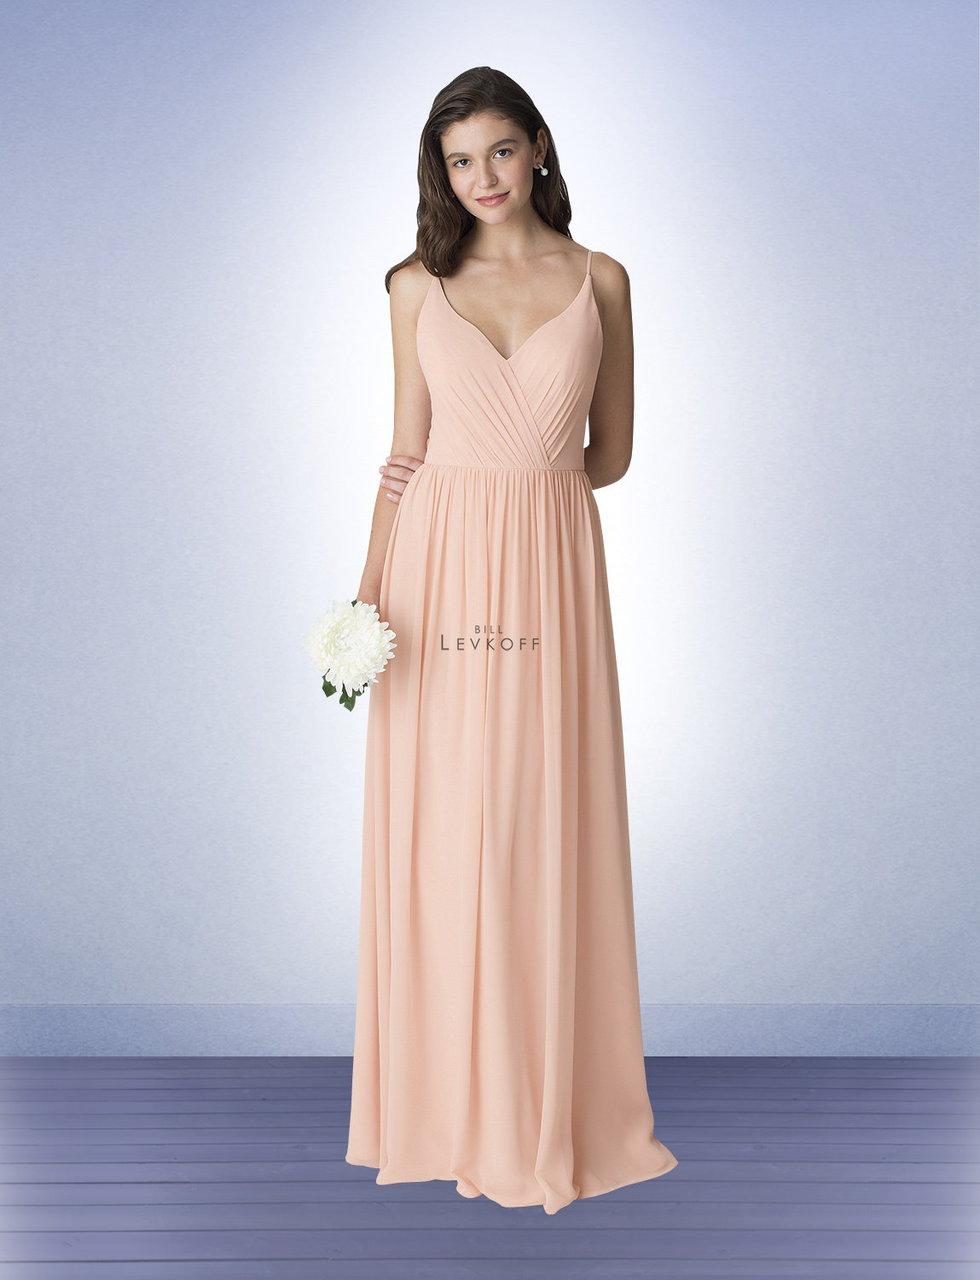 Levkoff bridesmaid dress style 1273 chiffon bill levkoff bridesmaid dress style 1273 chiffon ombrellifo Image collections